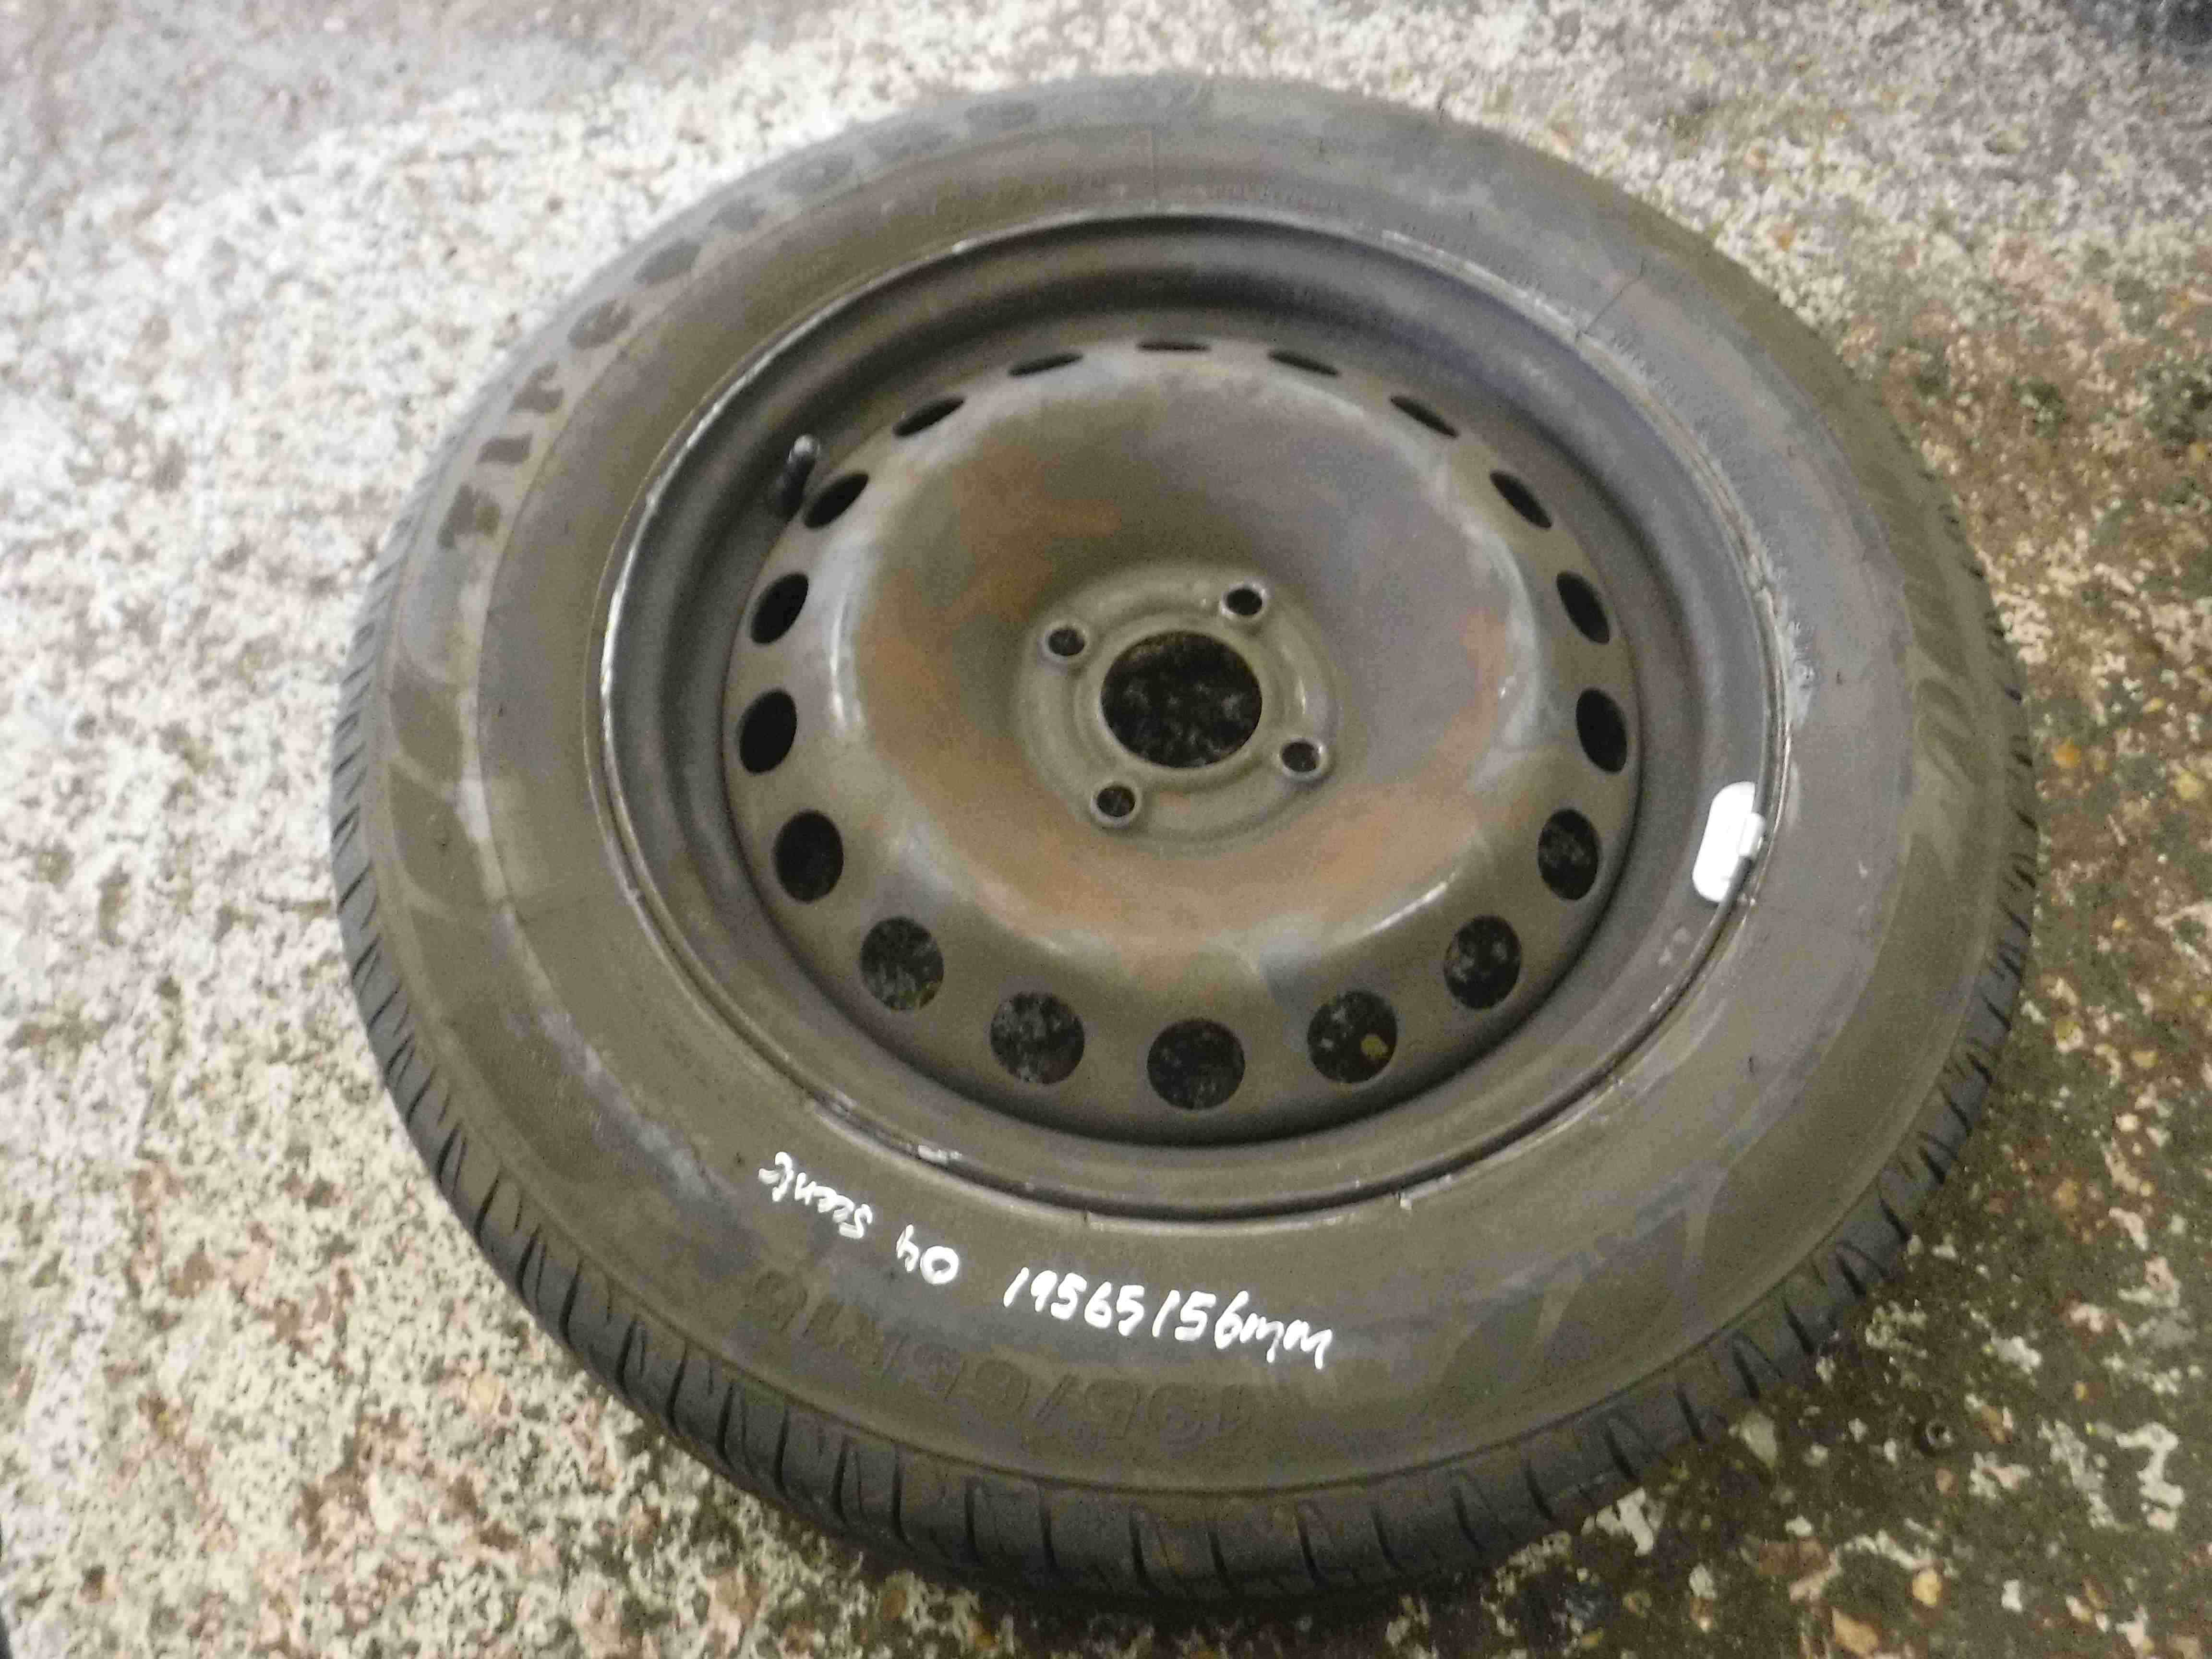 Renault Megane Scenic 2003-2009 Steel Wheel Rim + Tyre 195 65 15 6mm Tread